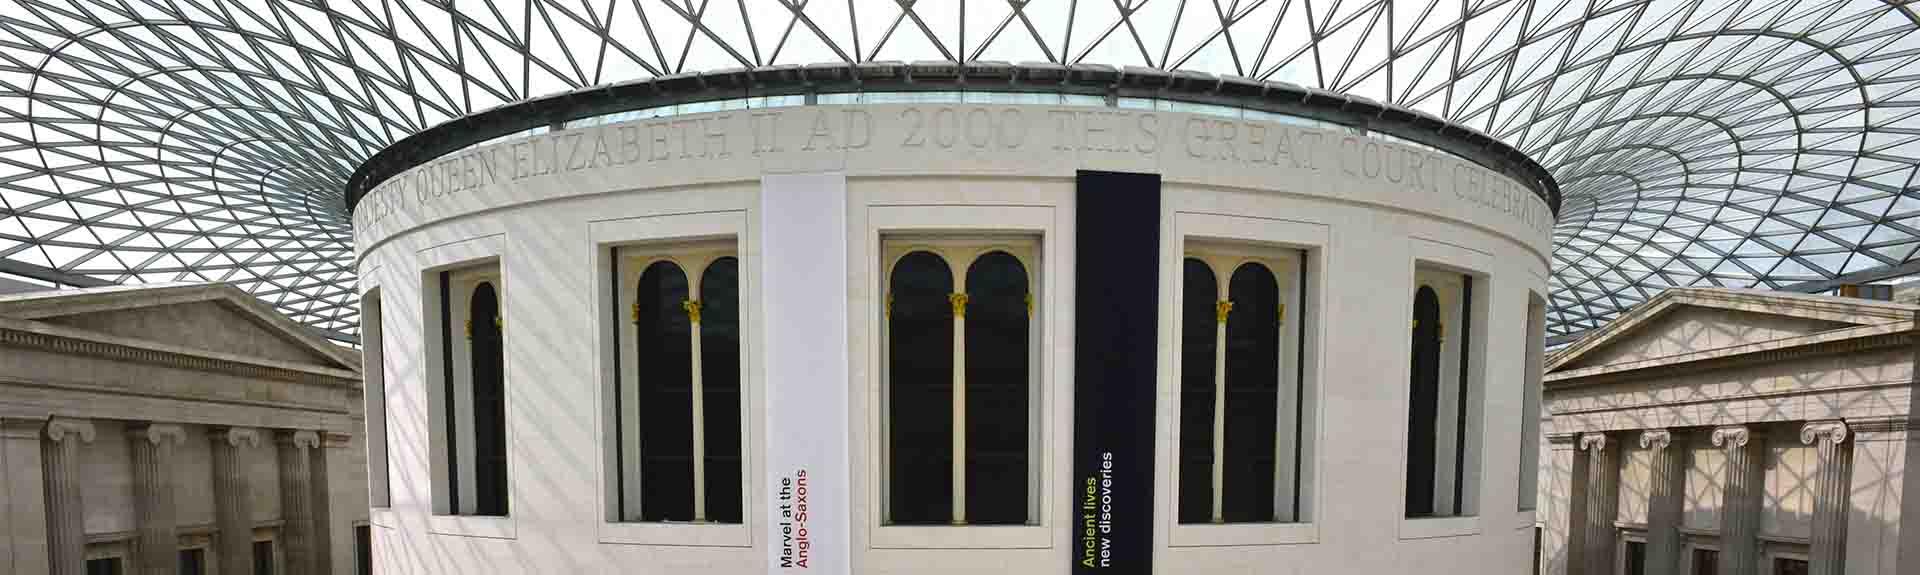 British Museum - Cours Grands musées du monde - UNIVA